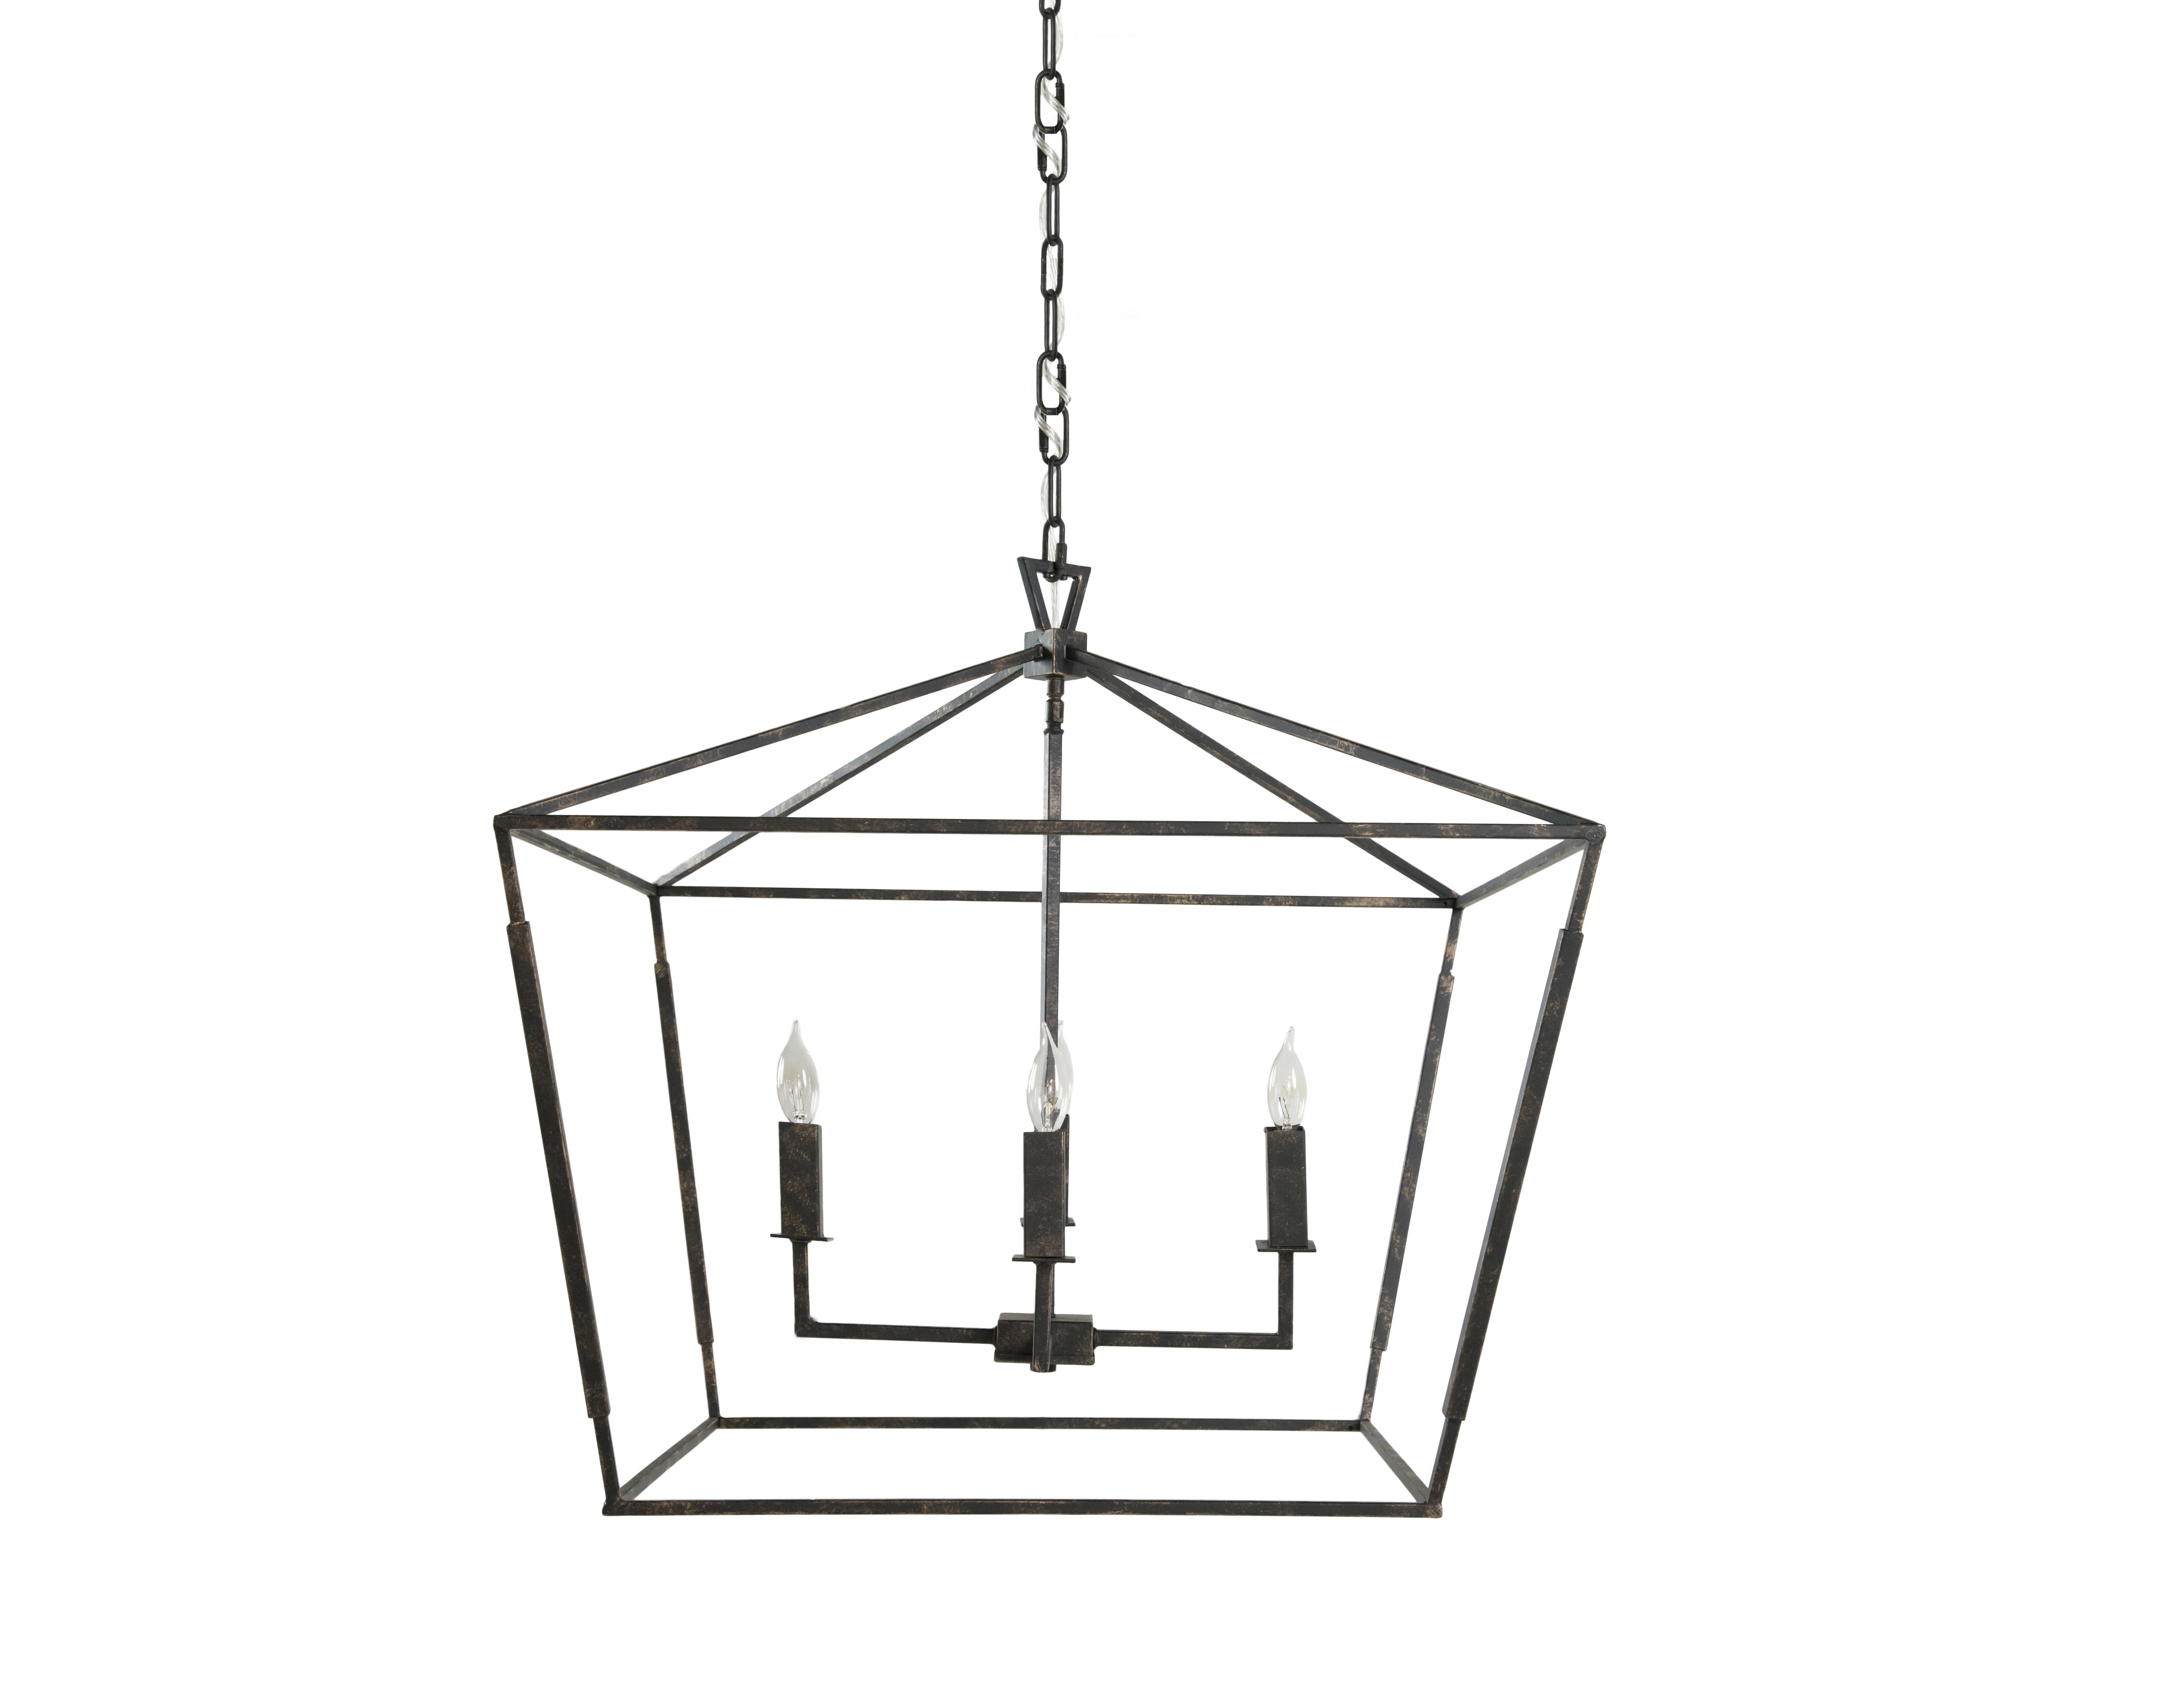 white foyer pendant lighting candle. White Foyer Pendant Lighting Candle. Inside Candle Wayfair